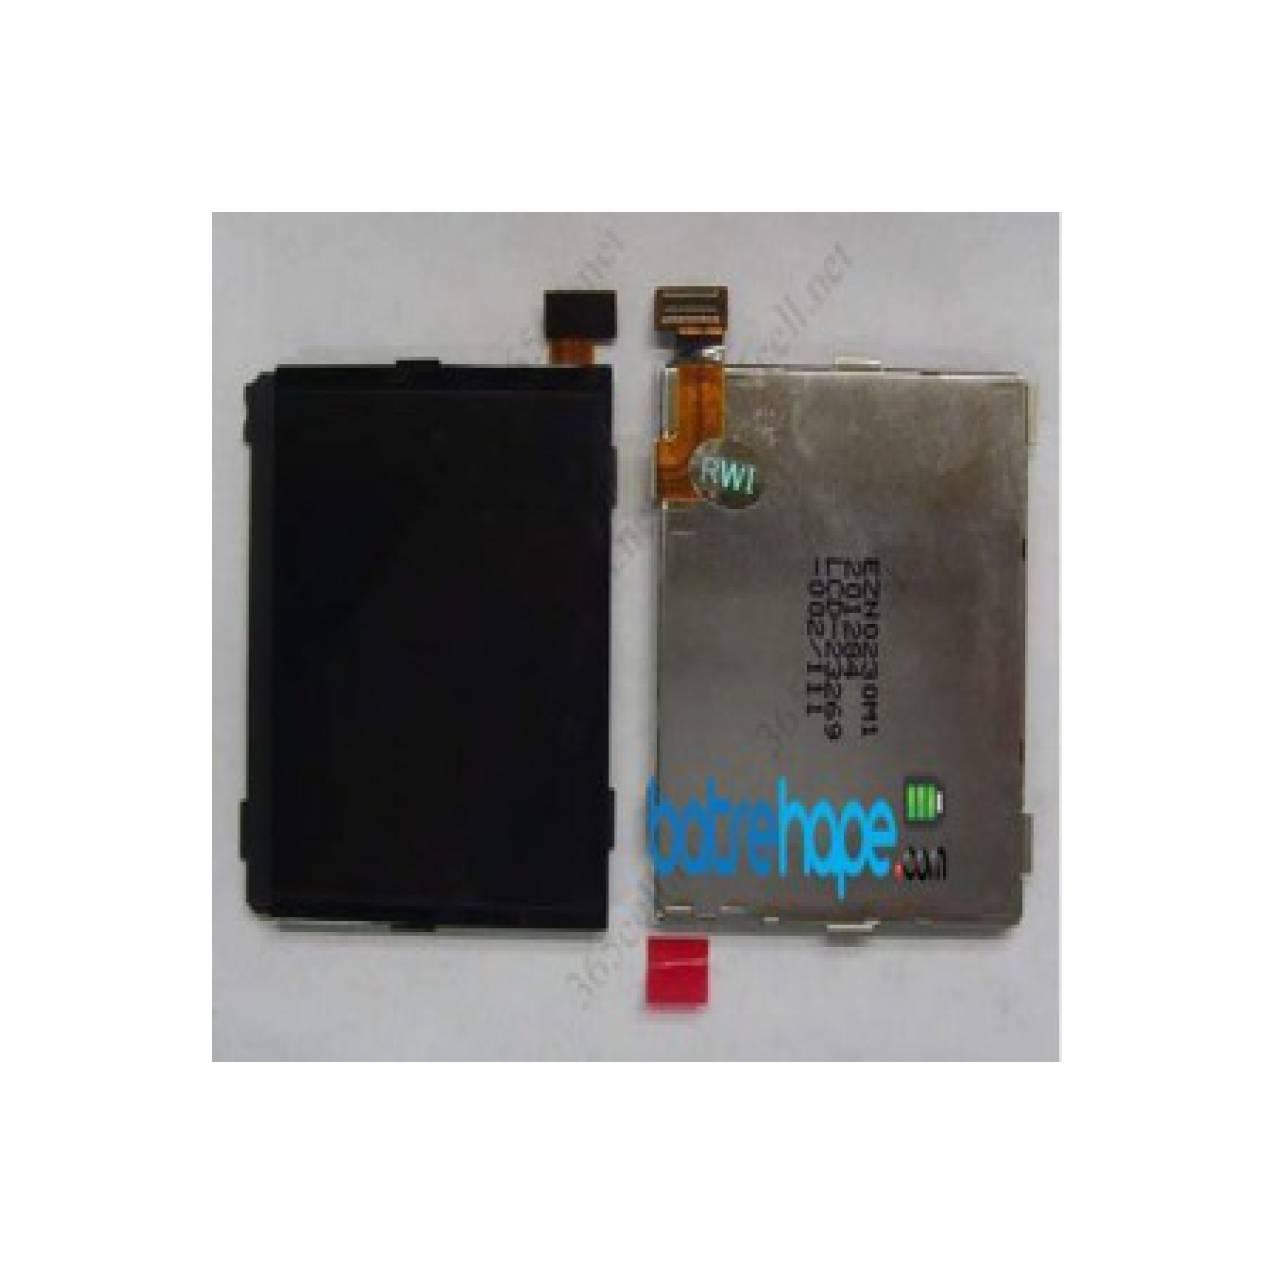 LCD BLackberry BB 9700 Onyx 002 Original